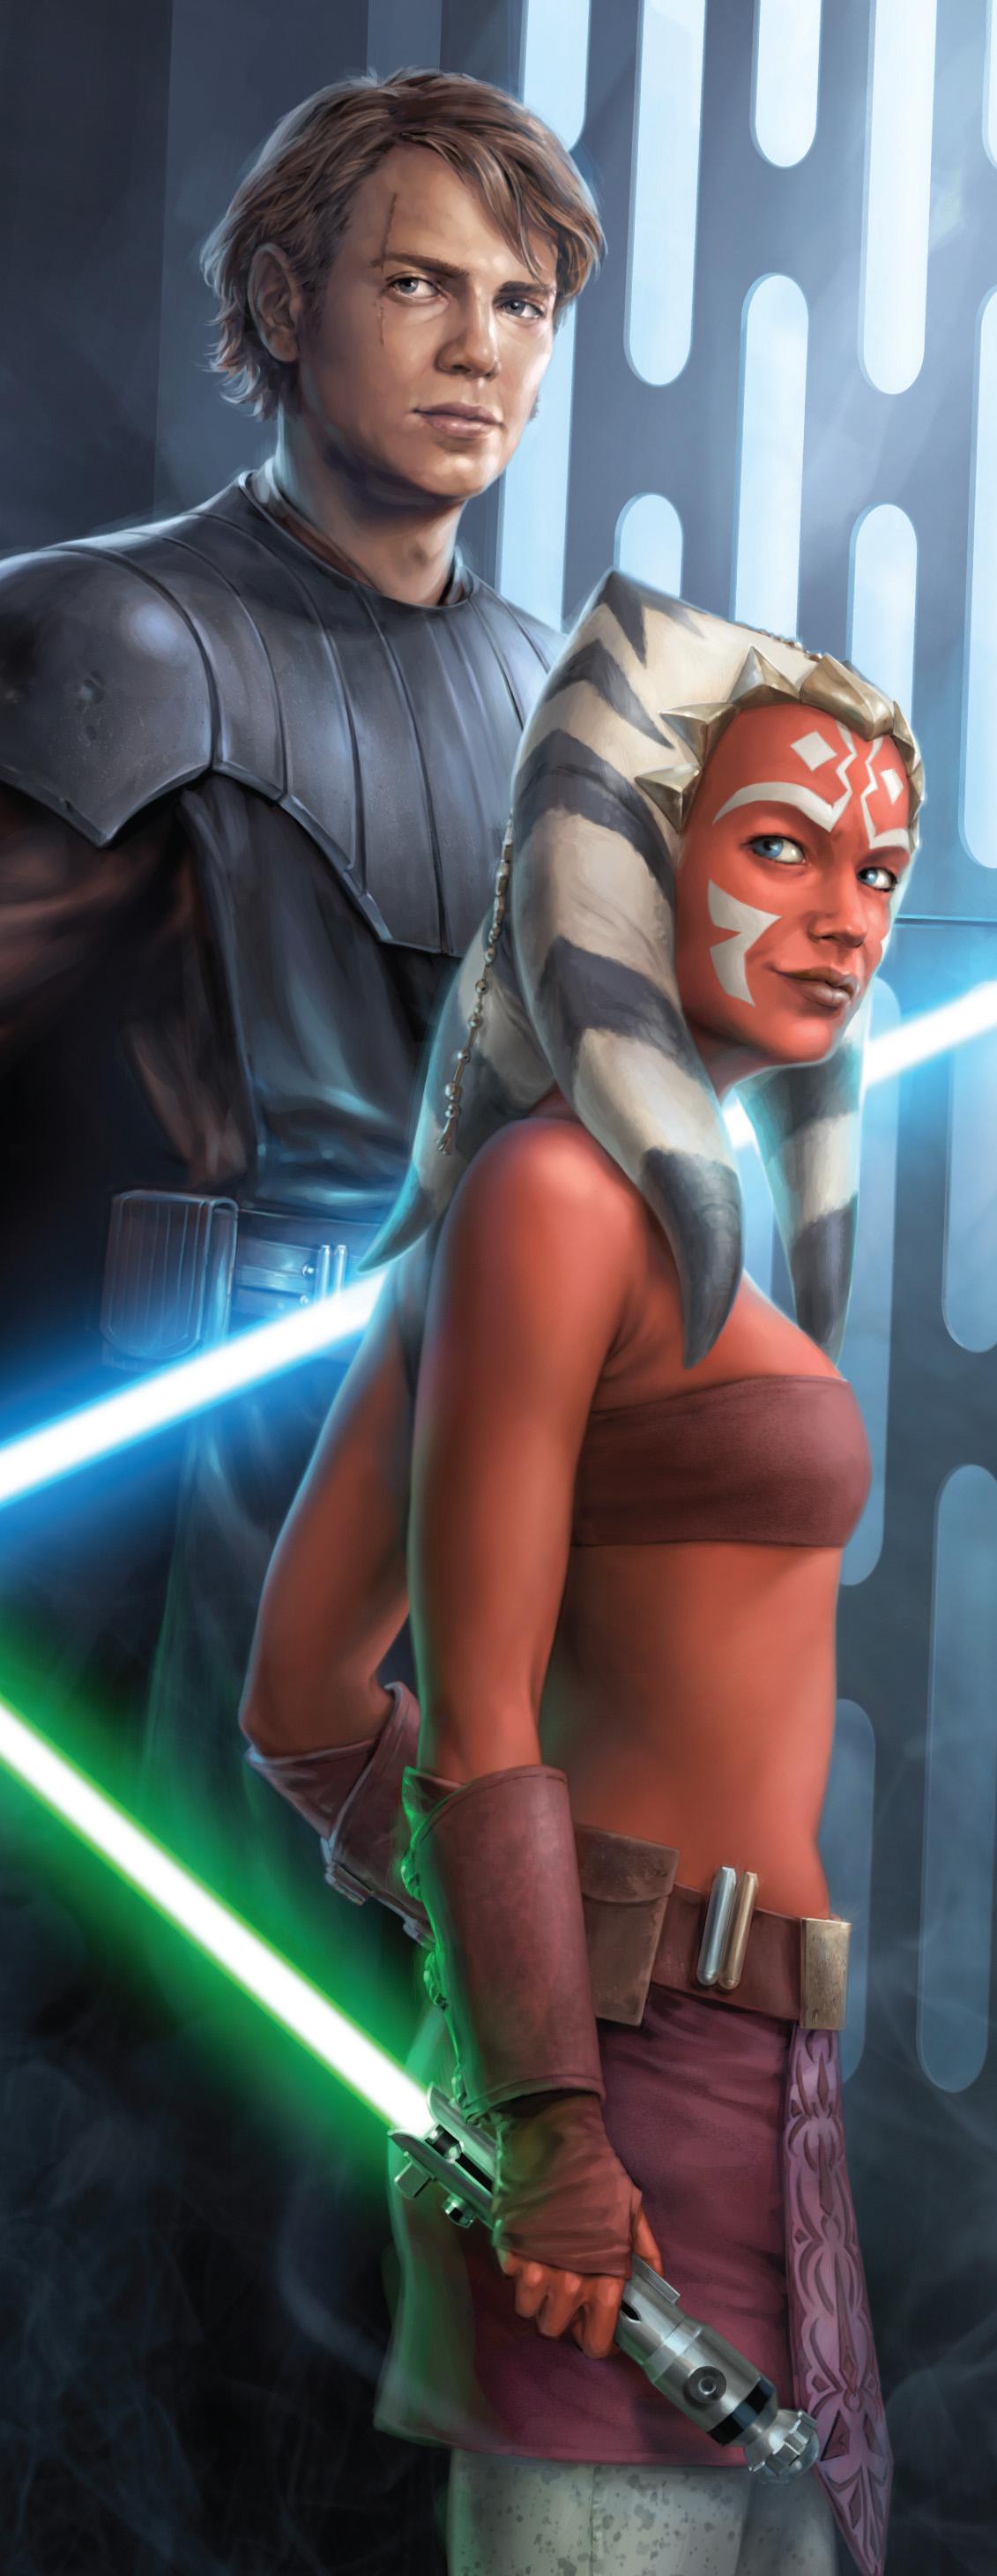 Star wars clone wars nude osuka anime galleries